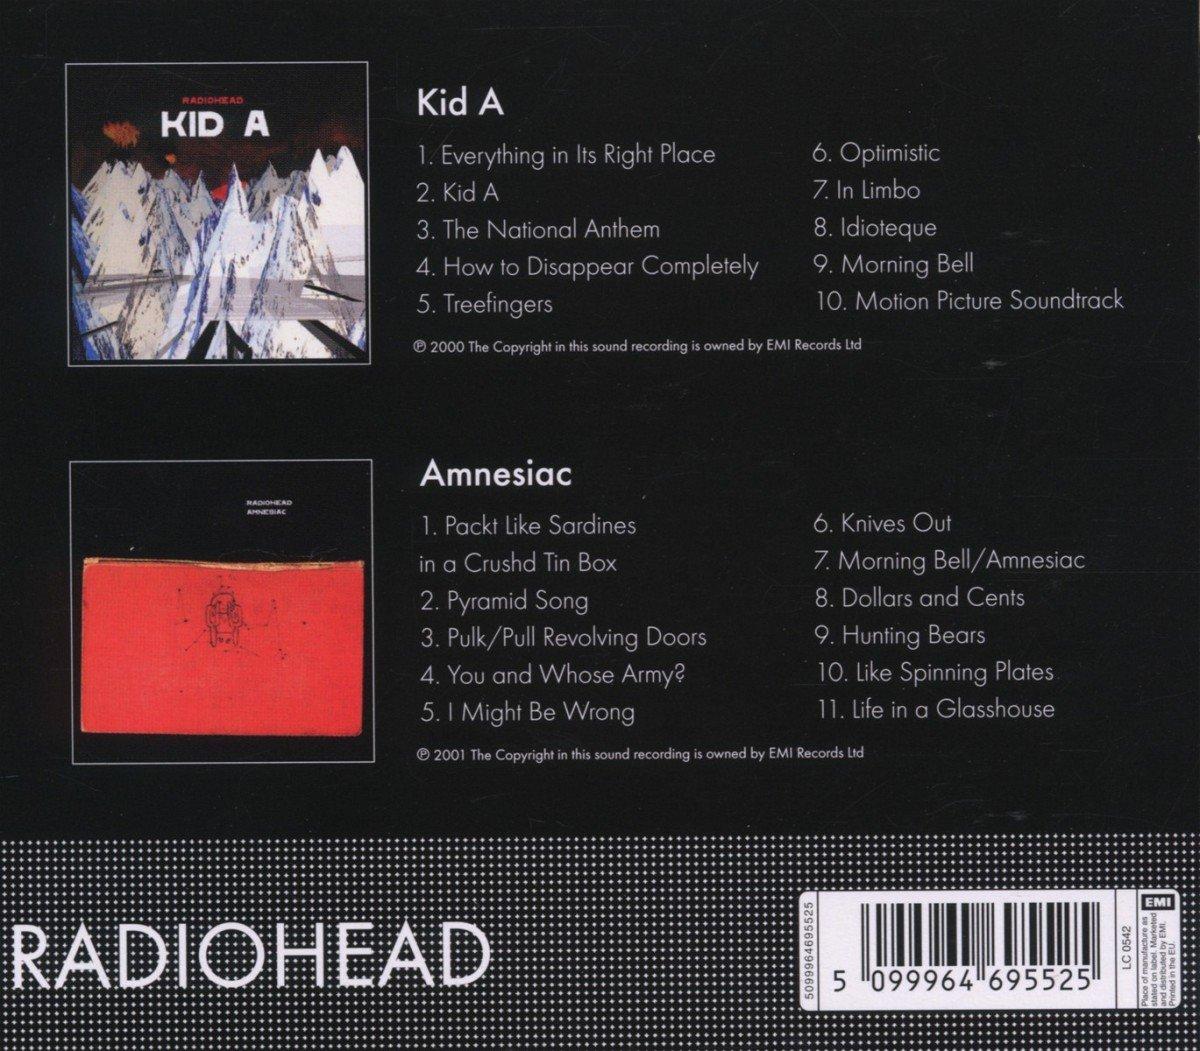 Kid a/Amnesiac: Radiohead: Amazon.es: Música